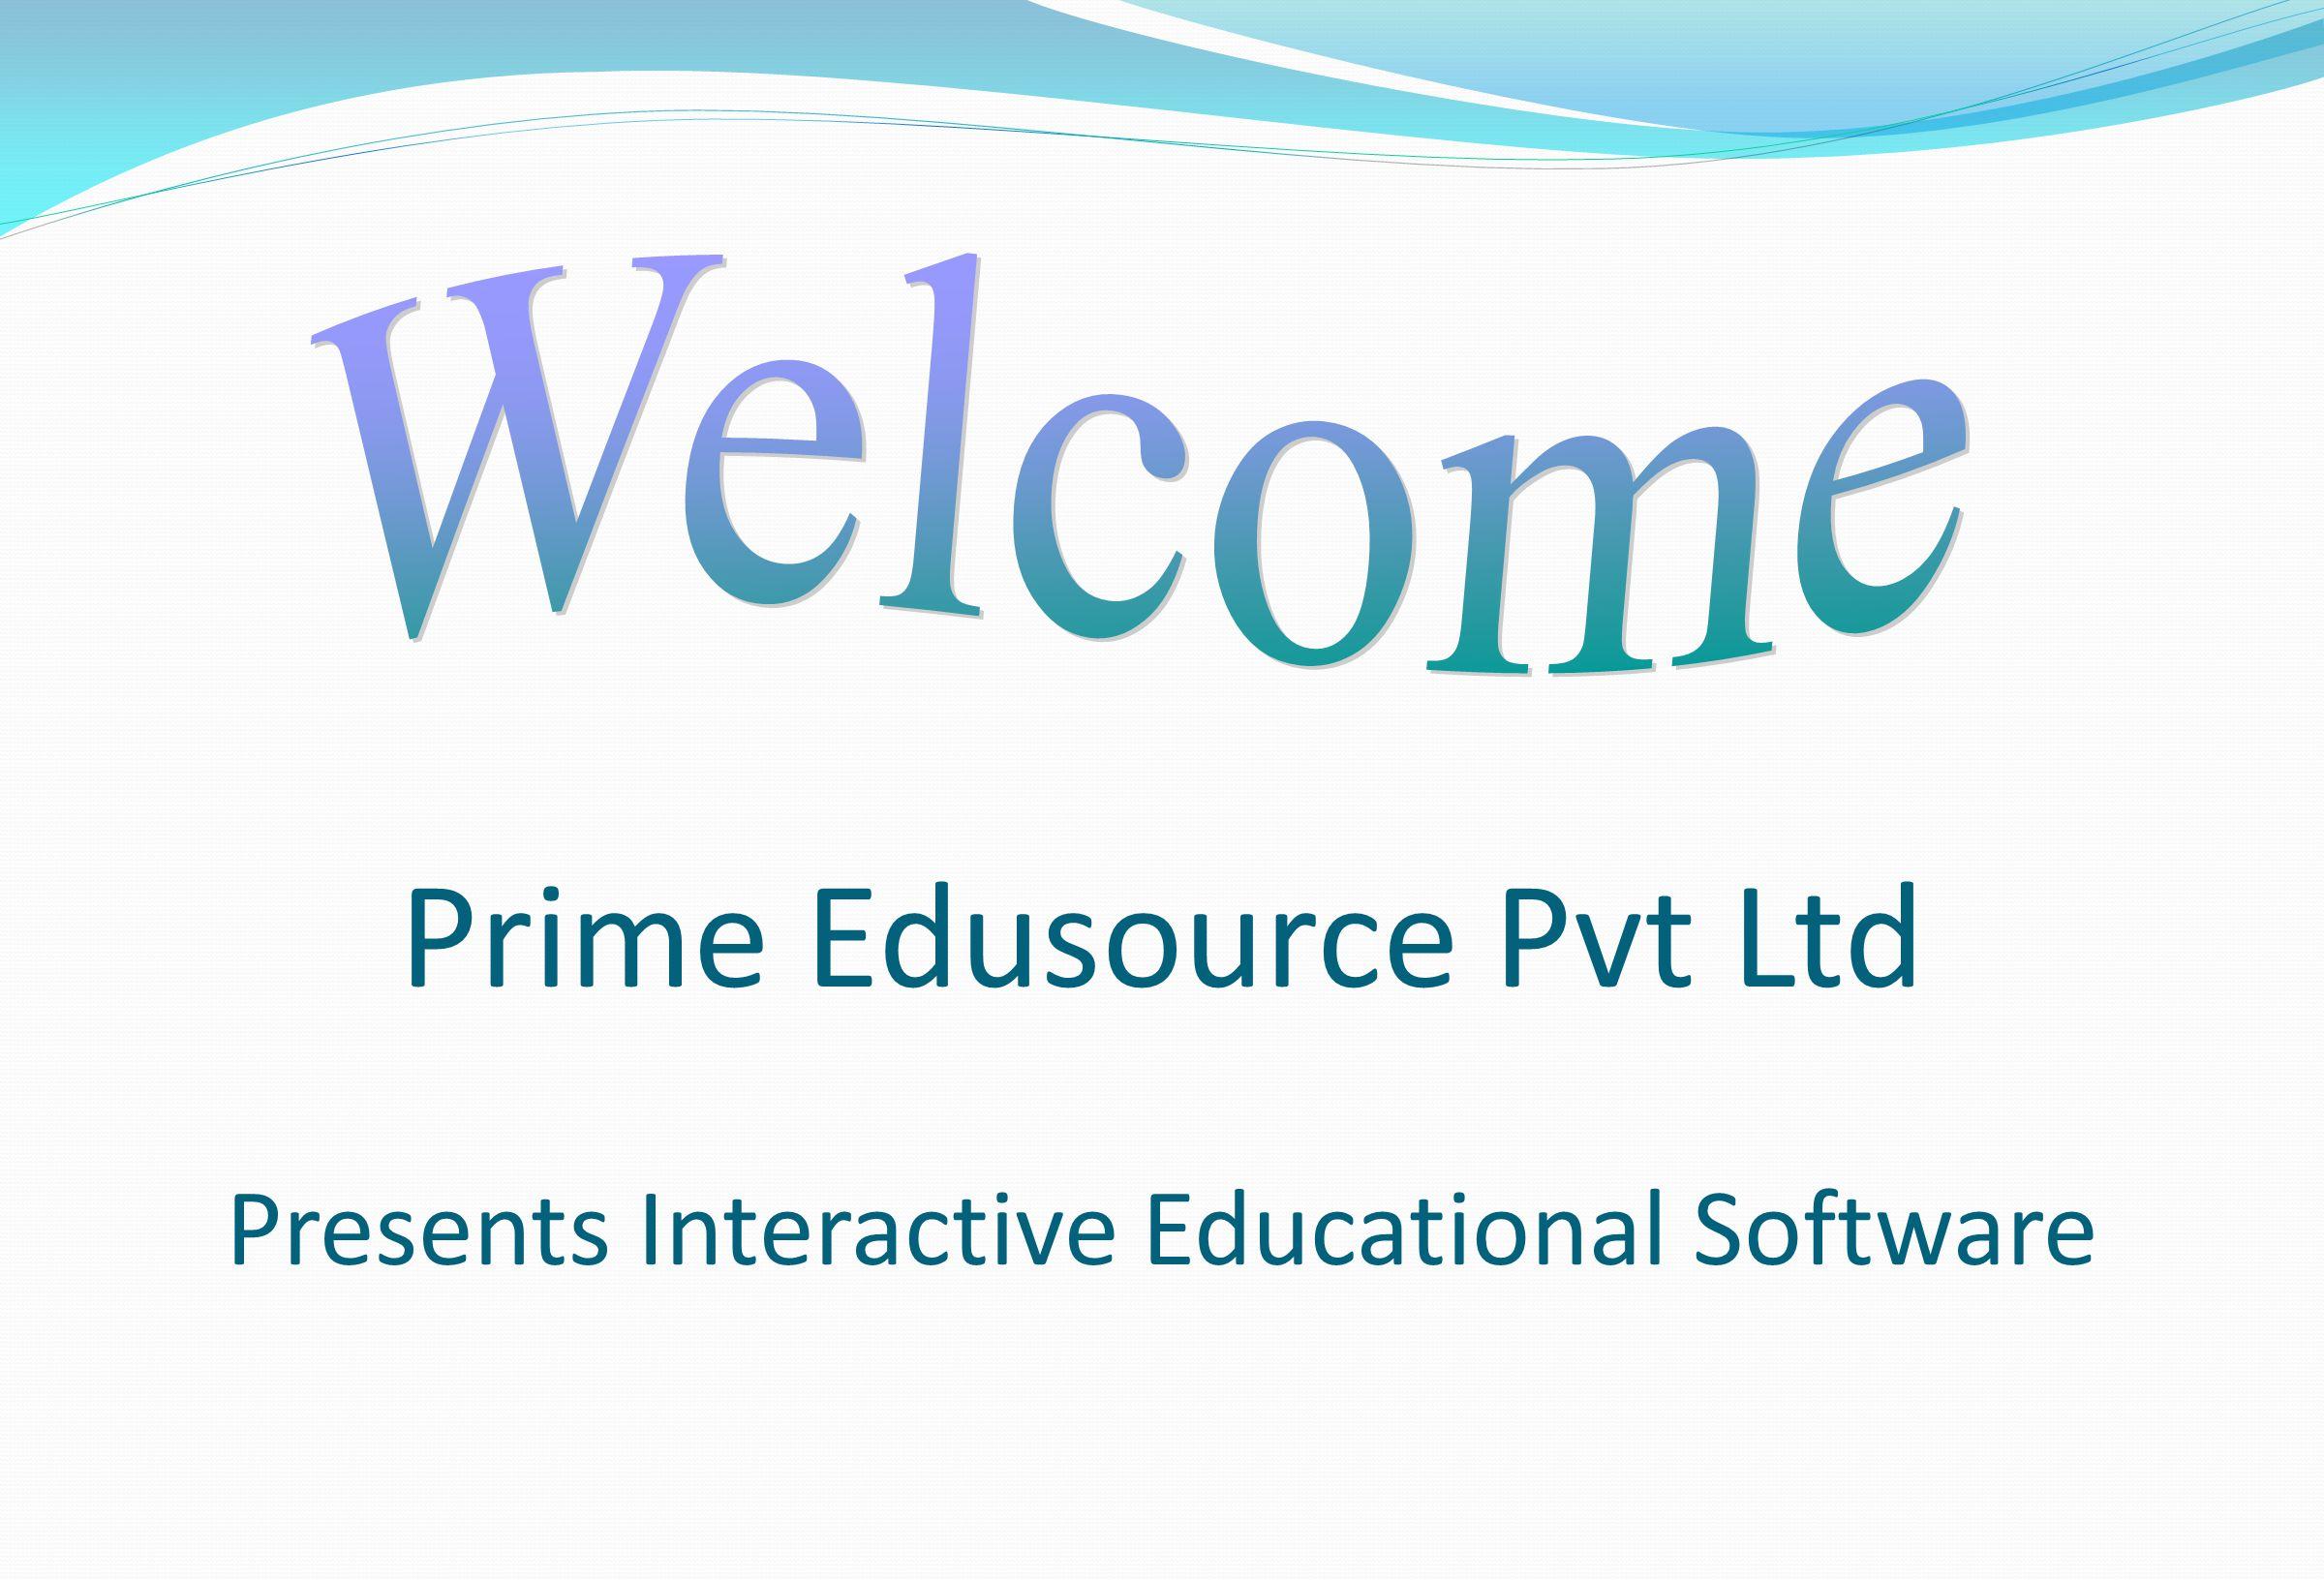 Prime Edusource Pvt Ltd Presents Interactive Educational Software